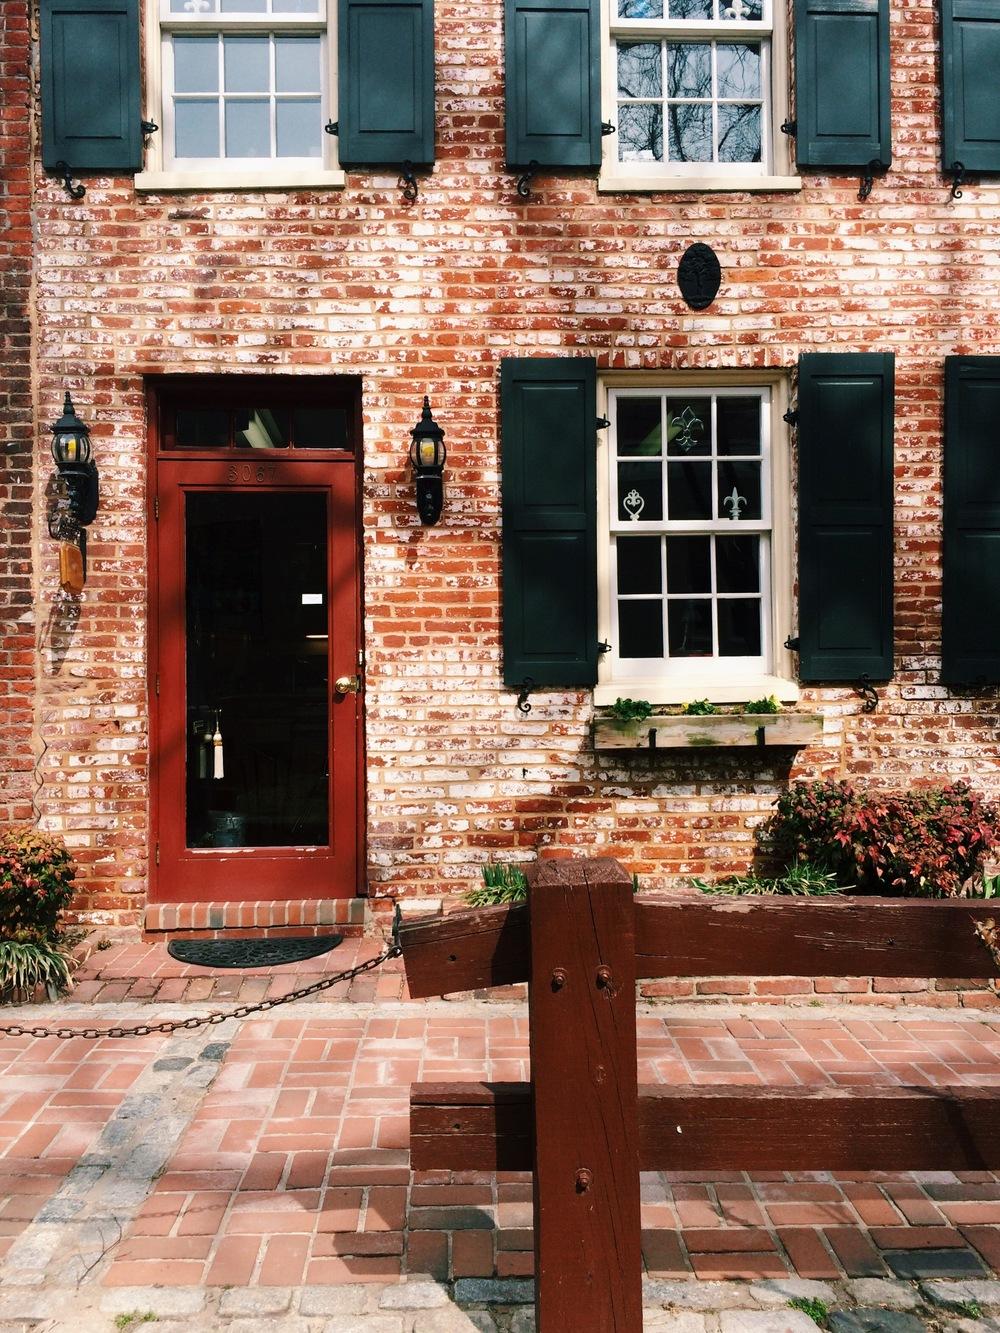 10-Foreign-Kitchens-Washington-DC | www.8thandlake.com.JPG